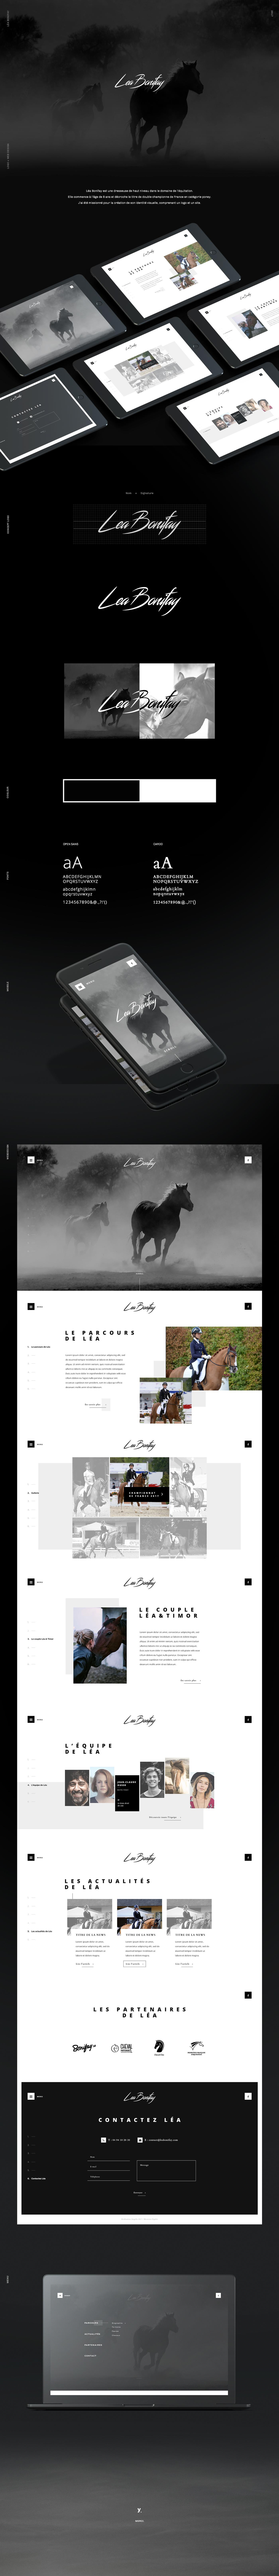 Web Web Design  graphisme logo branding  black Minimalism White horse photo